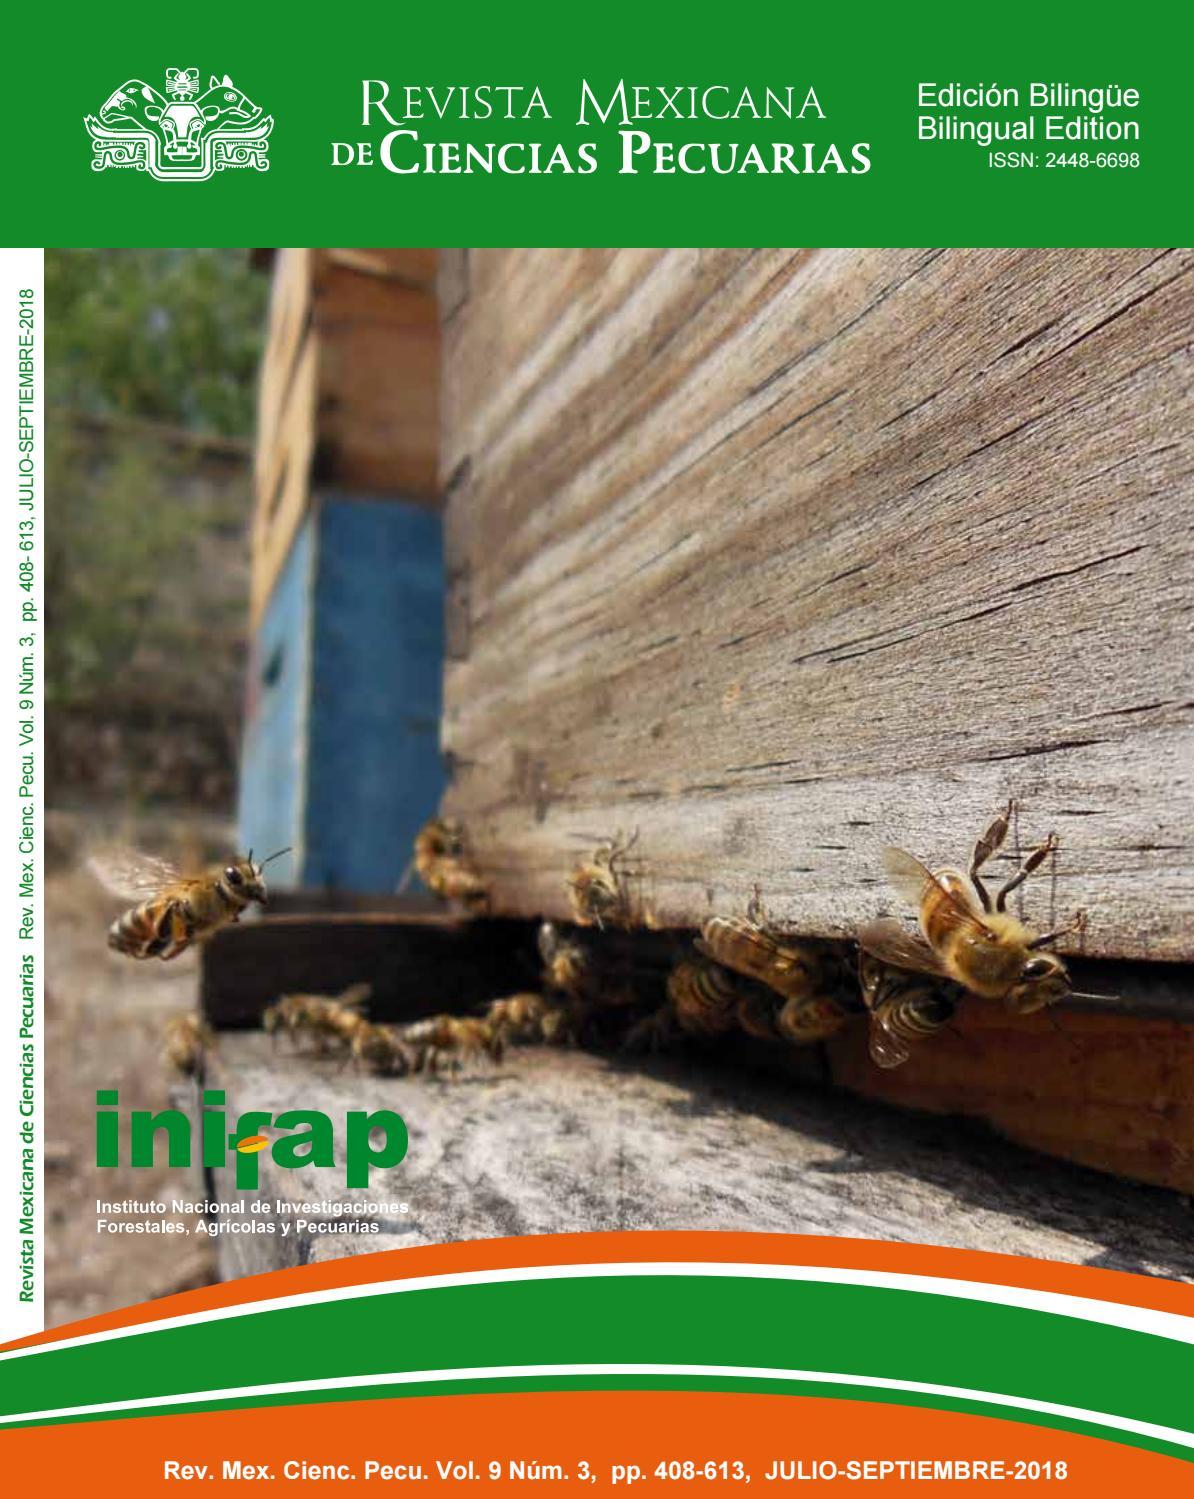 RMCP Vol. 9, NÚM 3, 2018 by Revista Mexicana de Ciencias Pecuarias ...